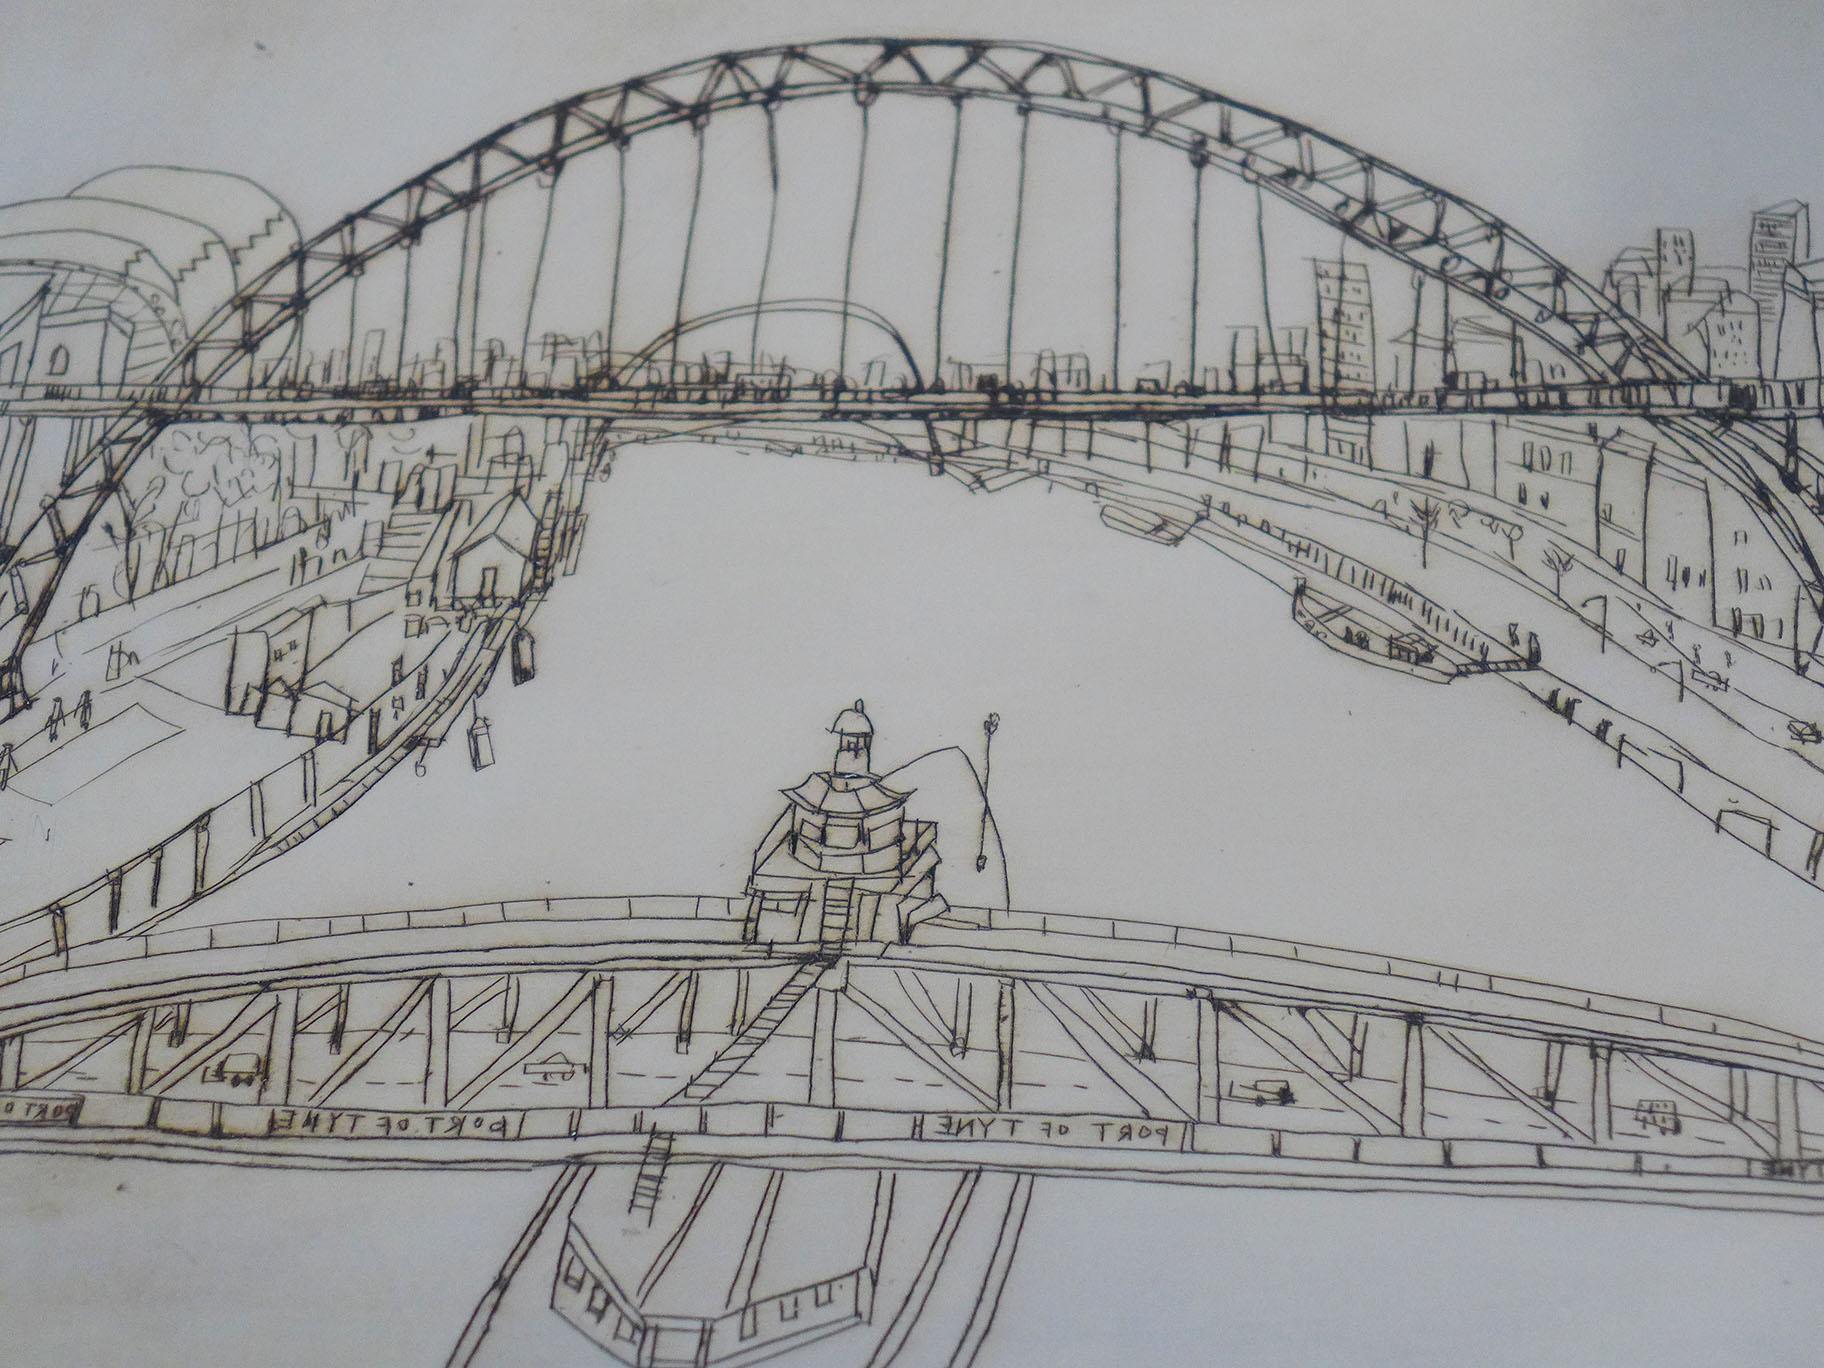 tyne_bridge_2_clare_caulfield.jpg